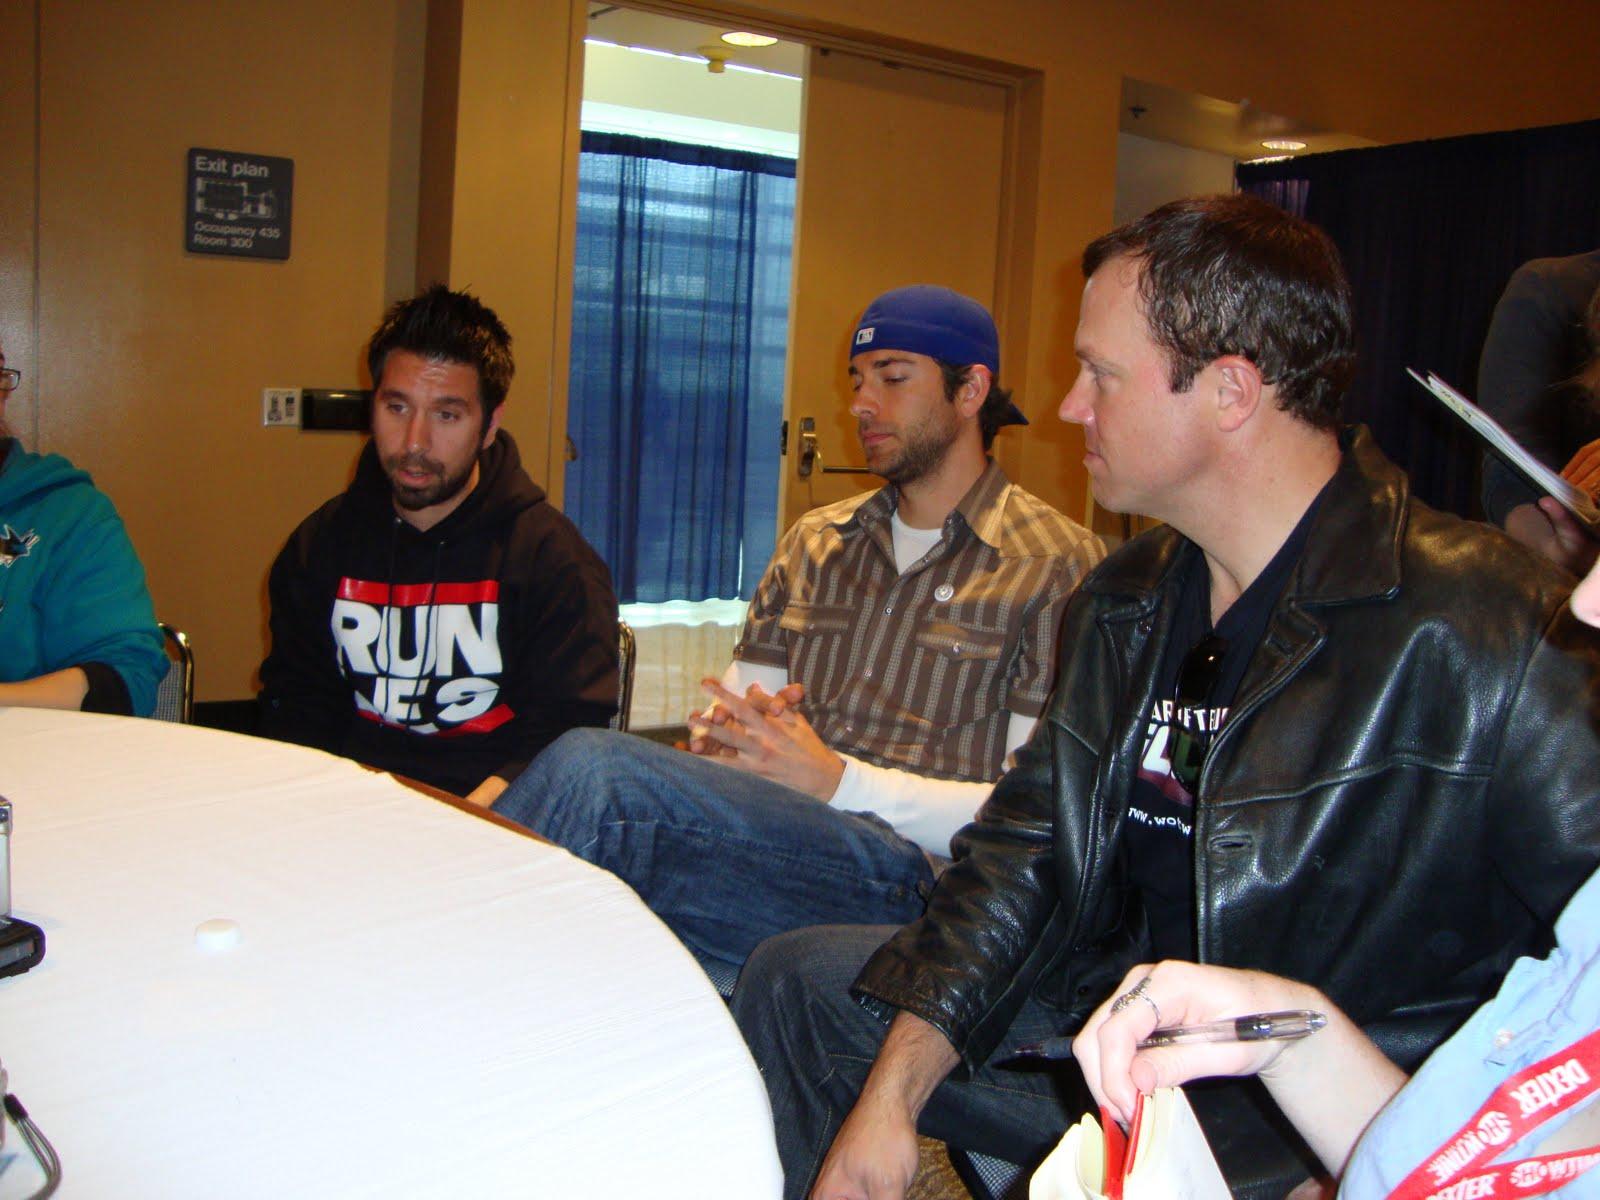 Chuck Cast Interviews Part Two Zachary Levi Joshua Gomez And Adam Baldwin Sandwichjohnfilms Nov 30th, 2011 at 12:59 pm. sandwichjohnfilms com